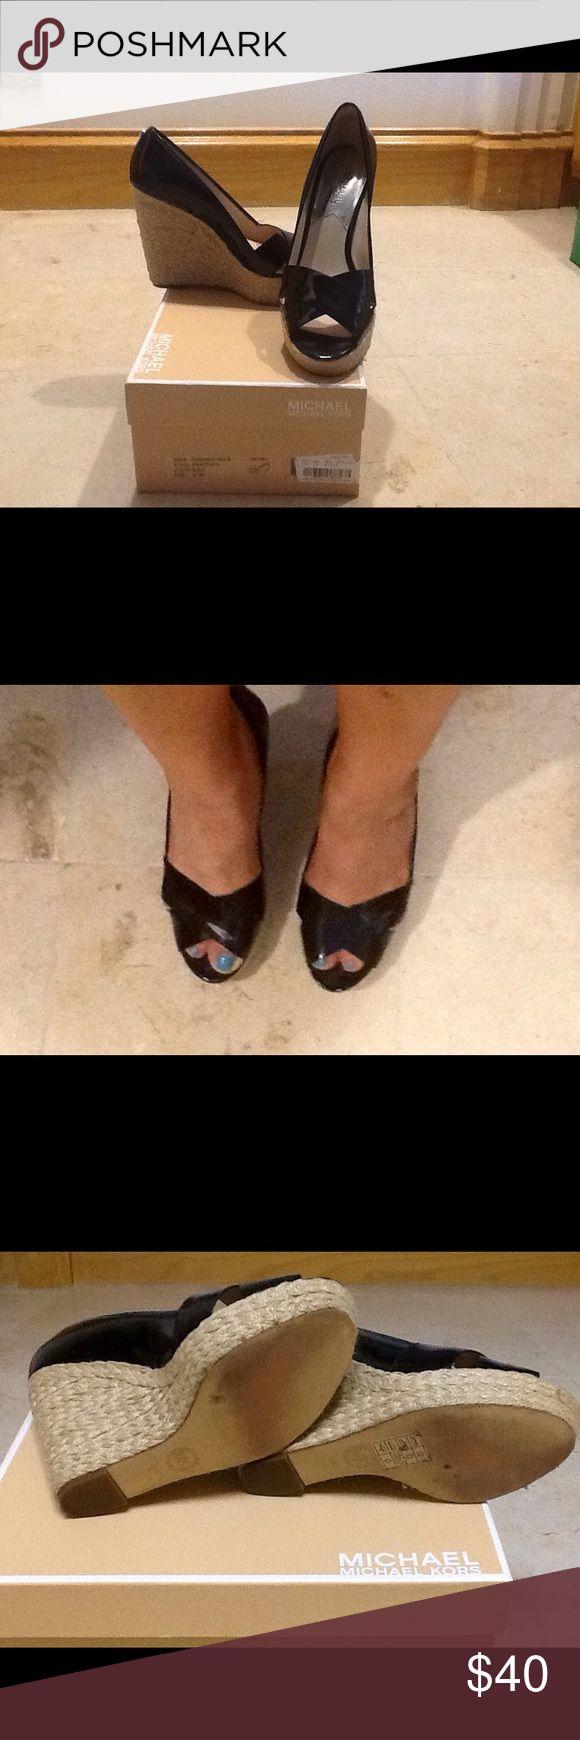 Michael Kors wedge Espadrille shoes 3 inch heel Patent black leather Michael Kors Espadrilles, gently worn Michael Kors Shoes Espadrilles